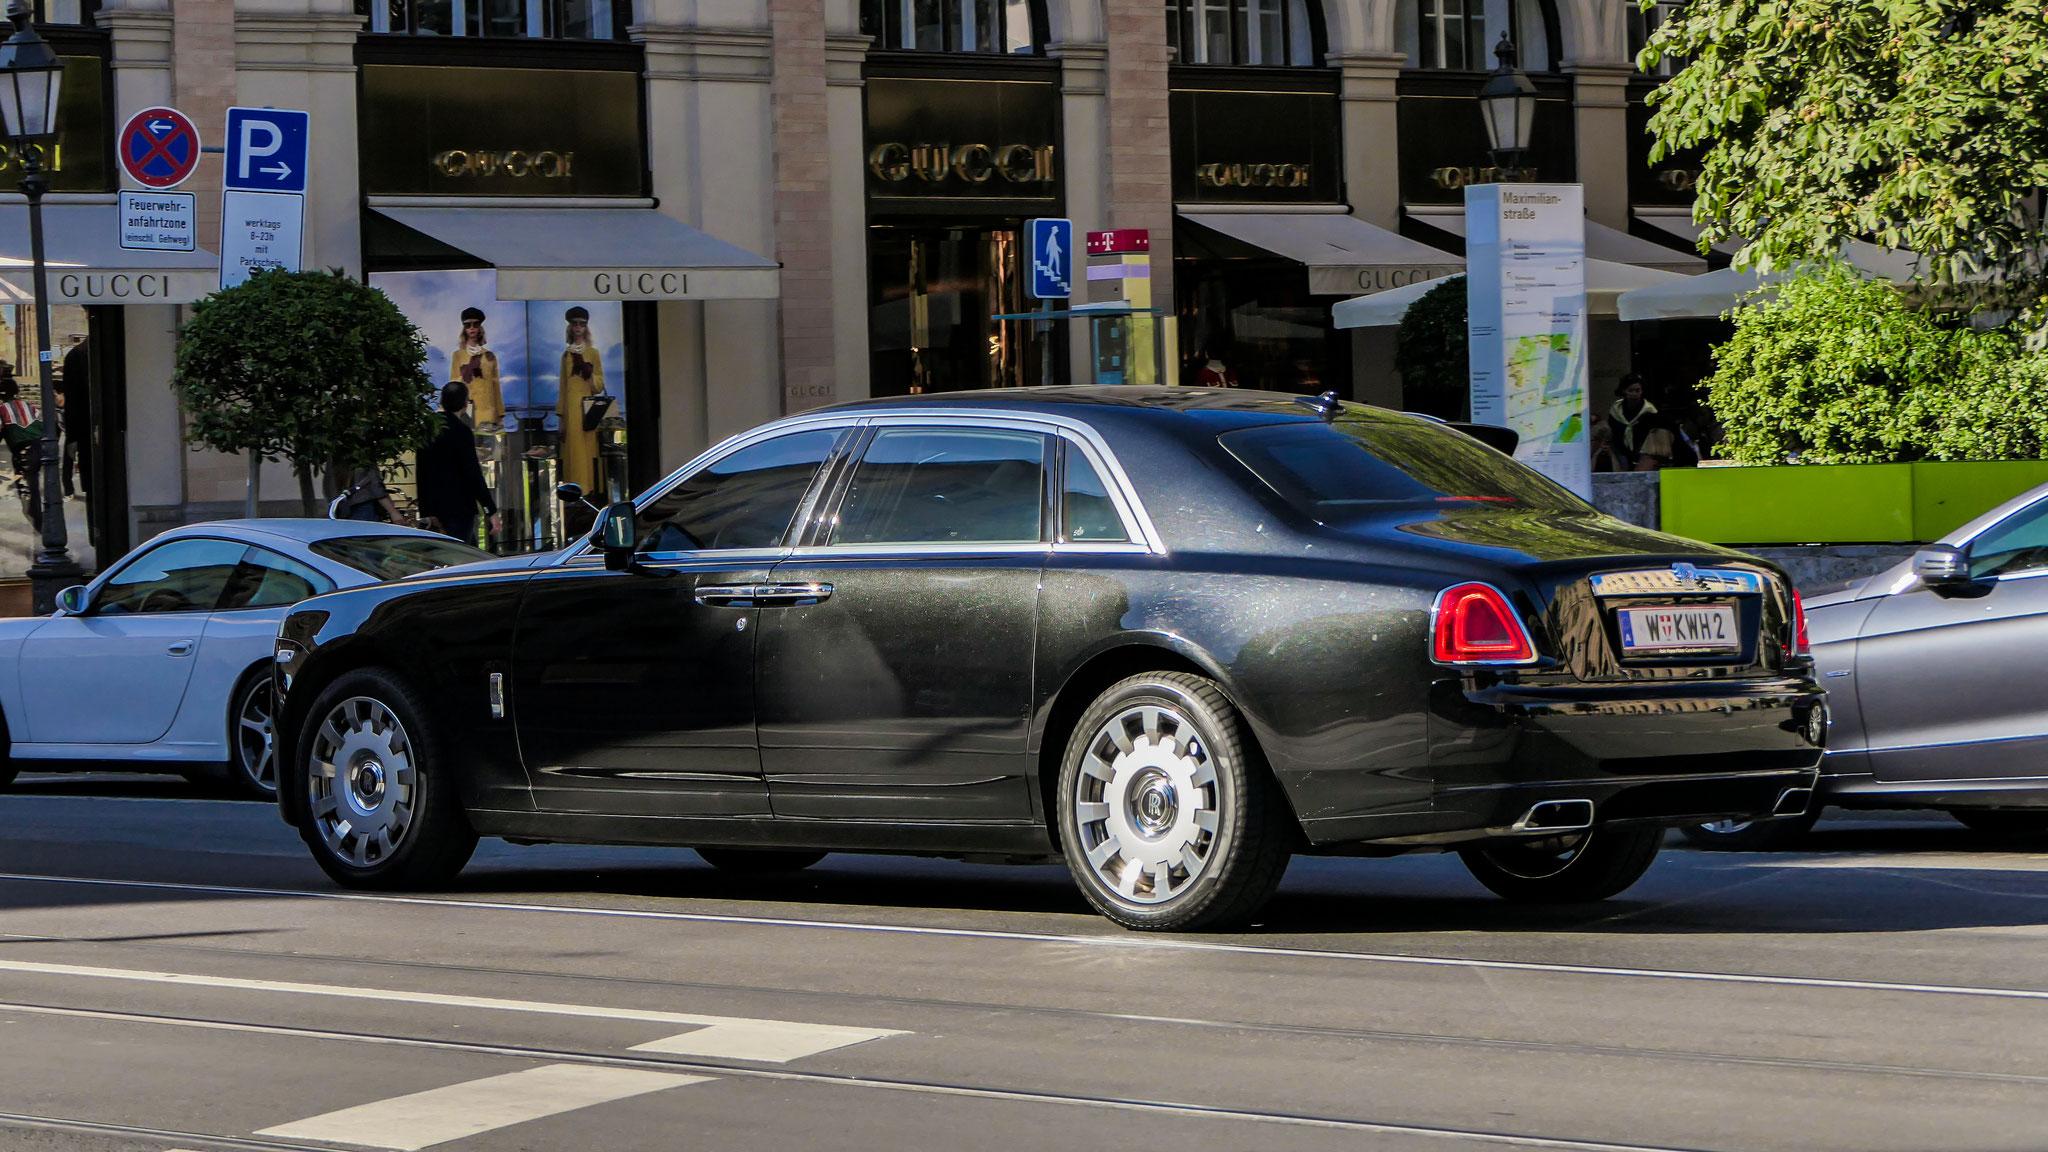 Rolls Royce Ghost Series II - W-KWH-2 (AUT)